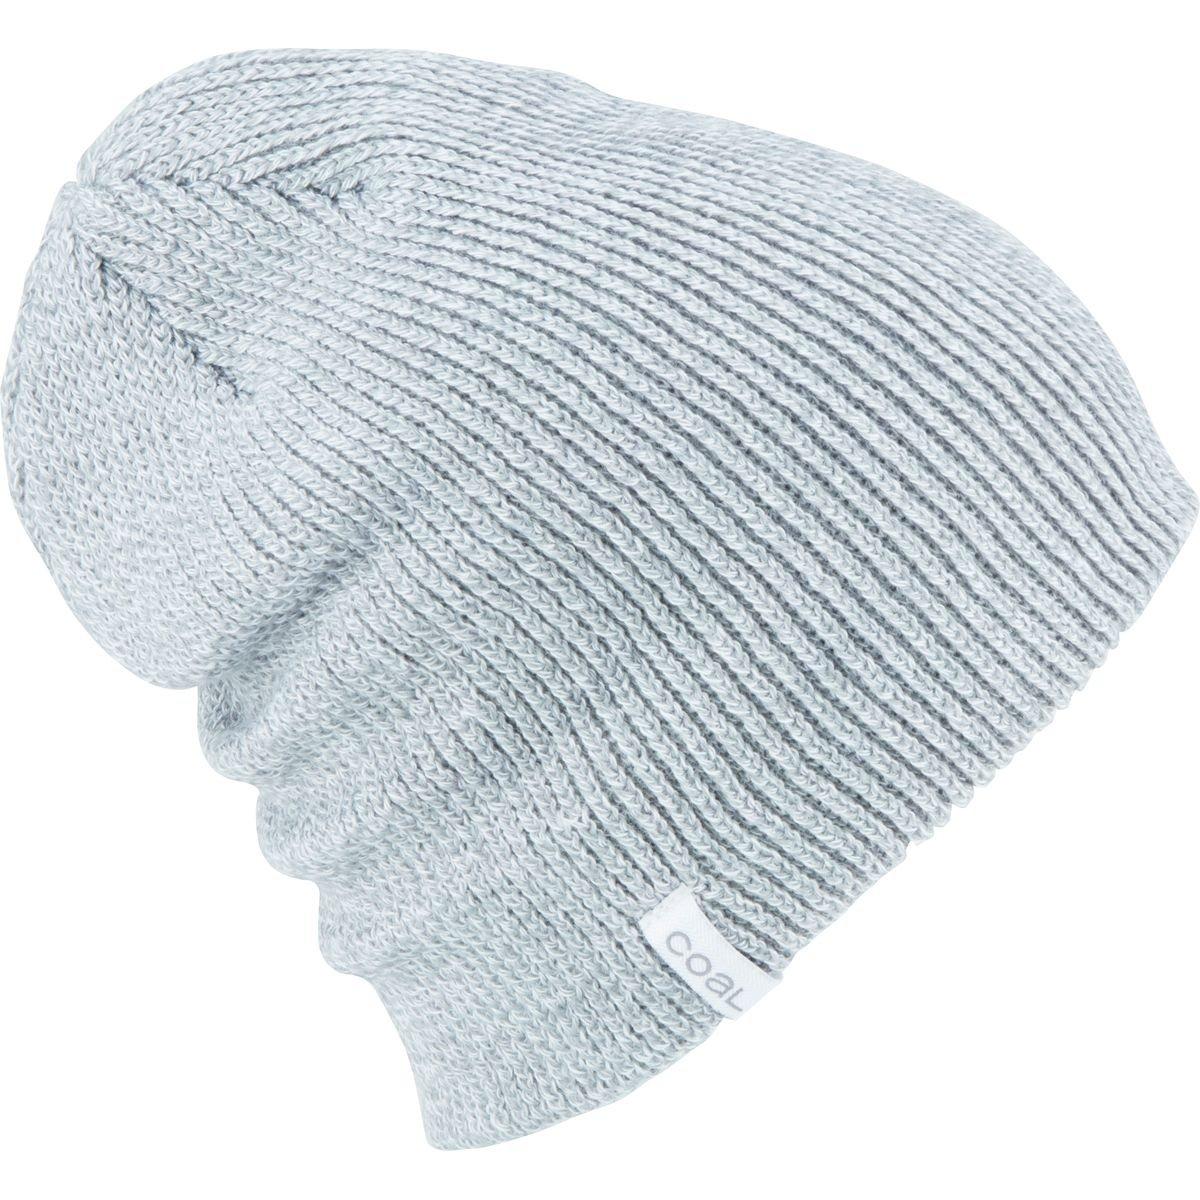 Amazon.com  Coal Unisex The Frena Solid Beanie Light Grey Marl  Clothing ce83c6b1783